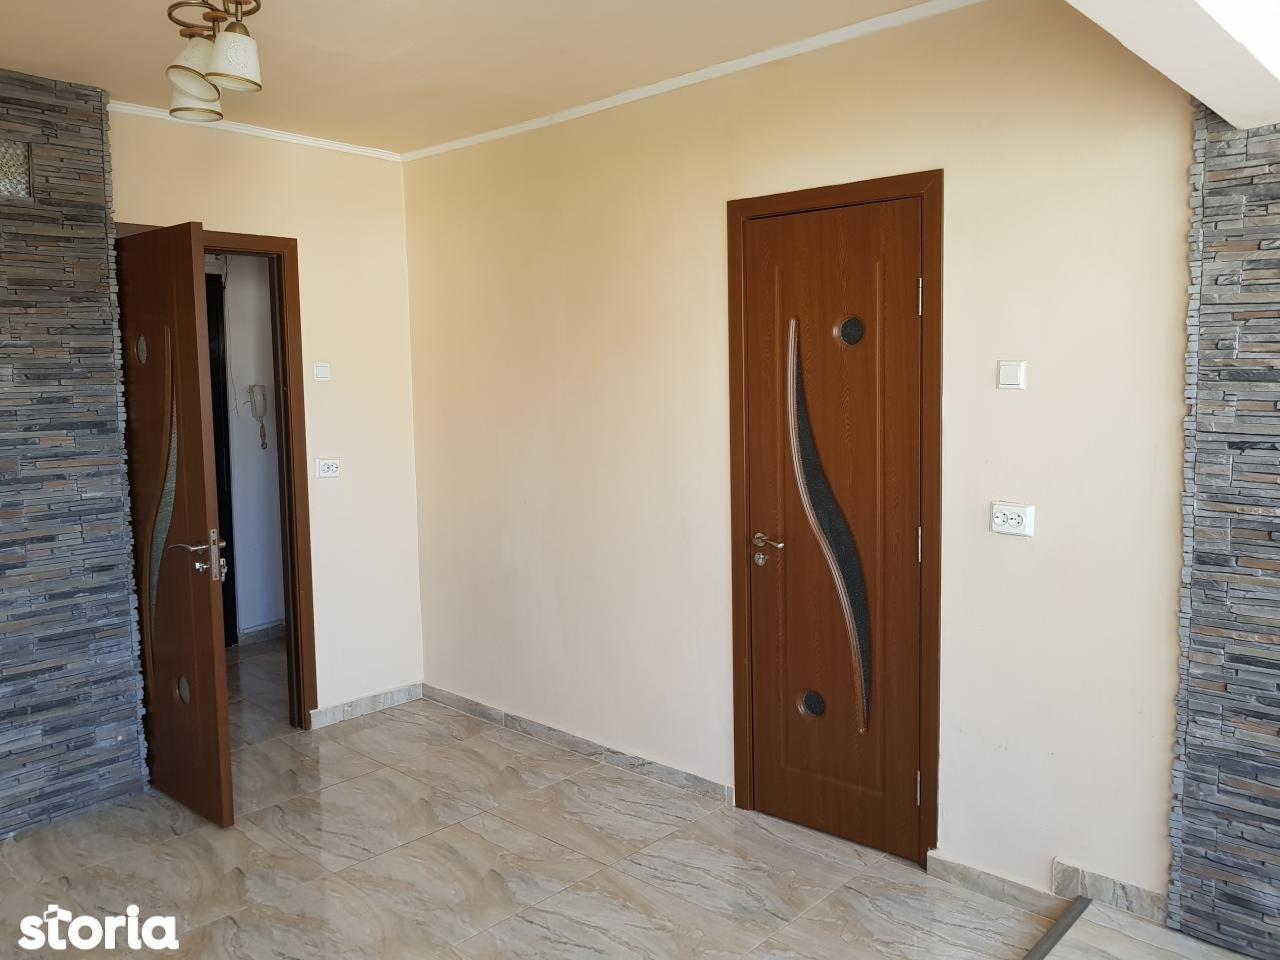 Apartament 4 camere de vanzare, str. Seleusului Oradea